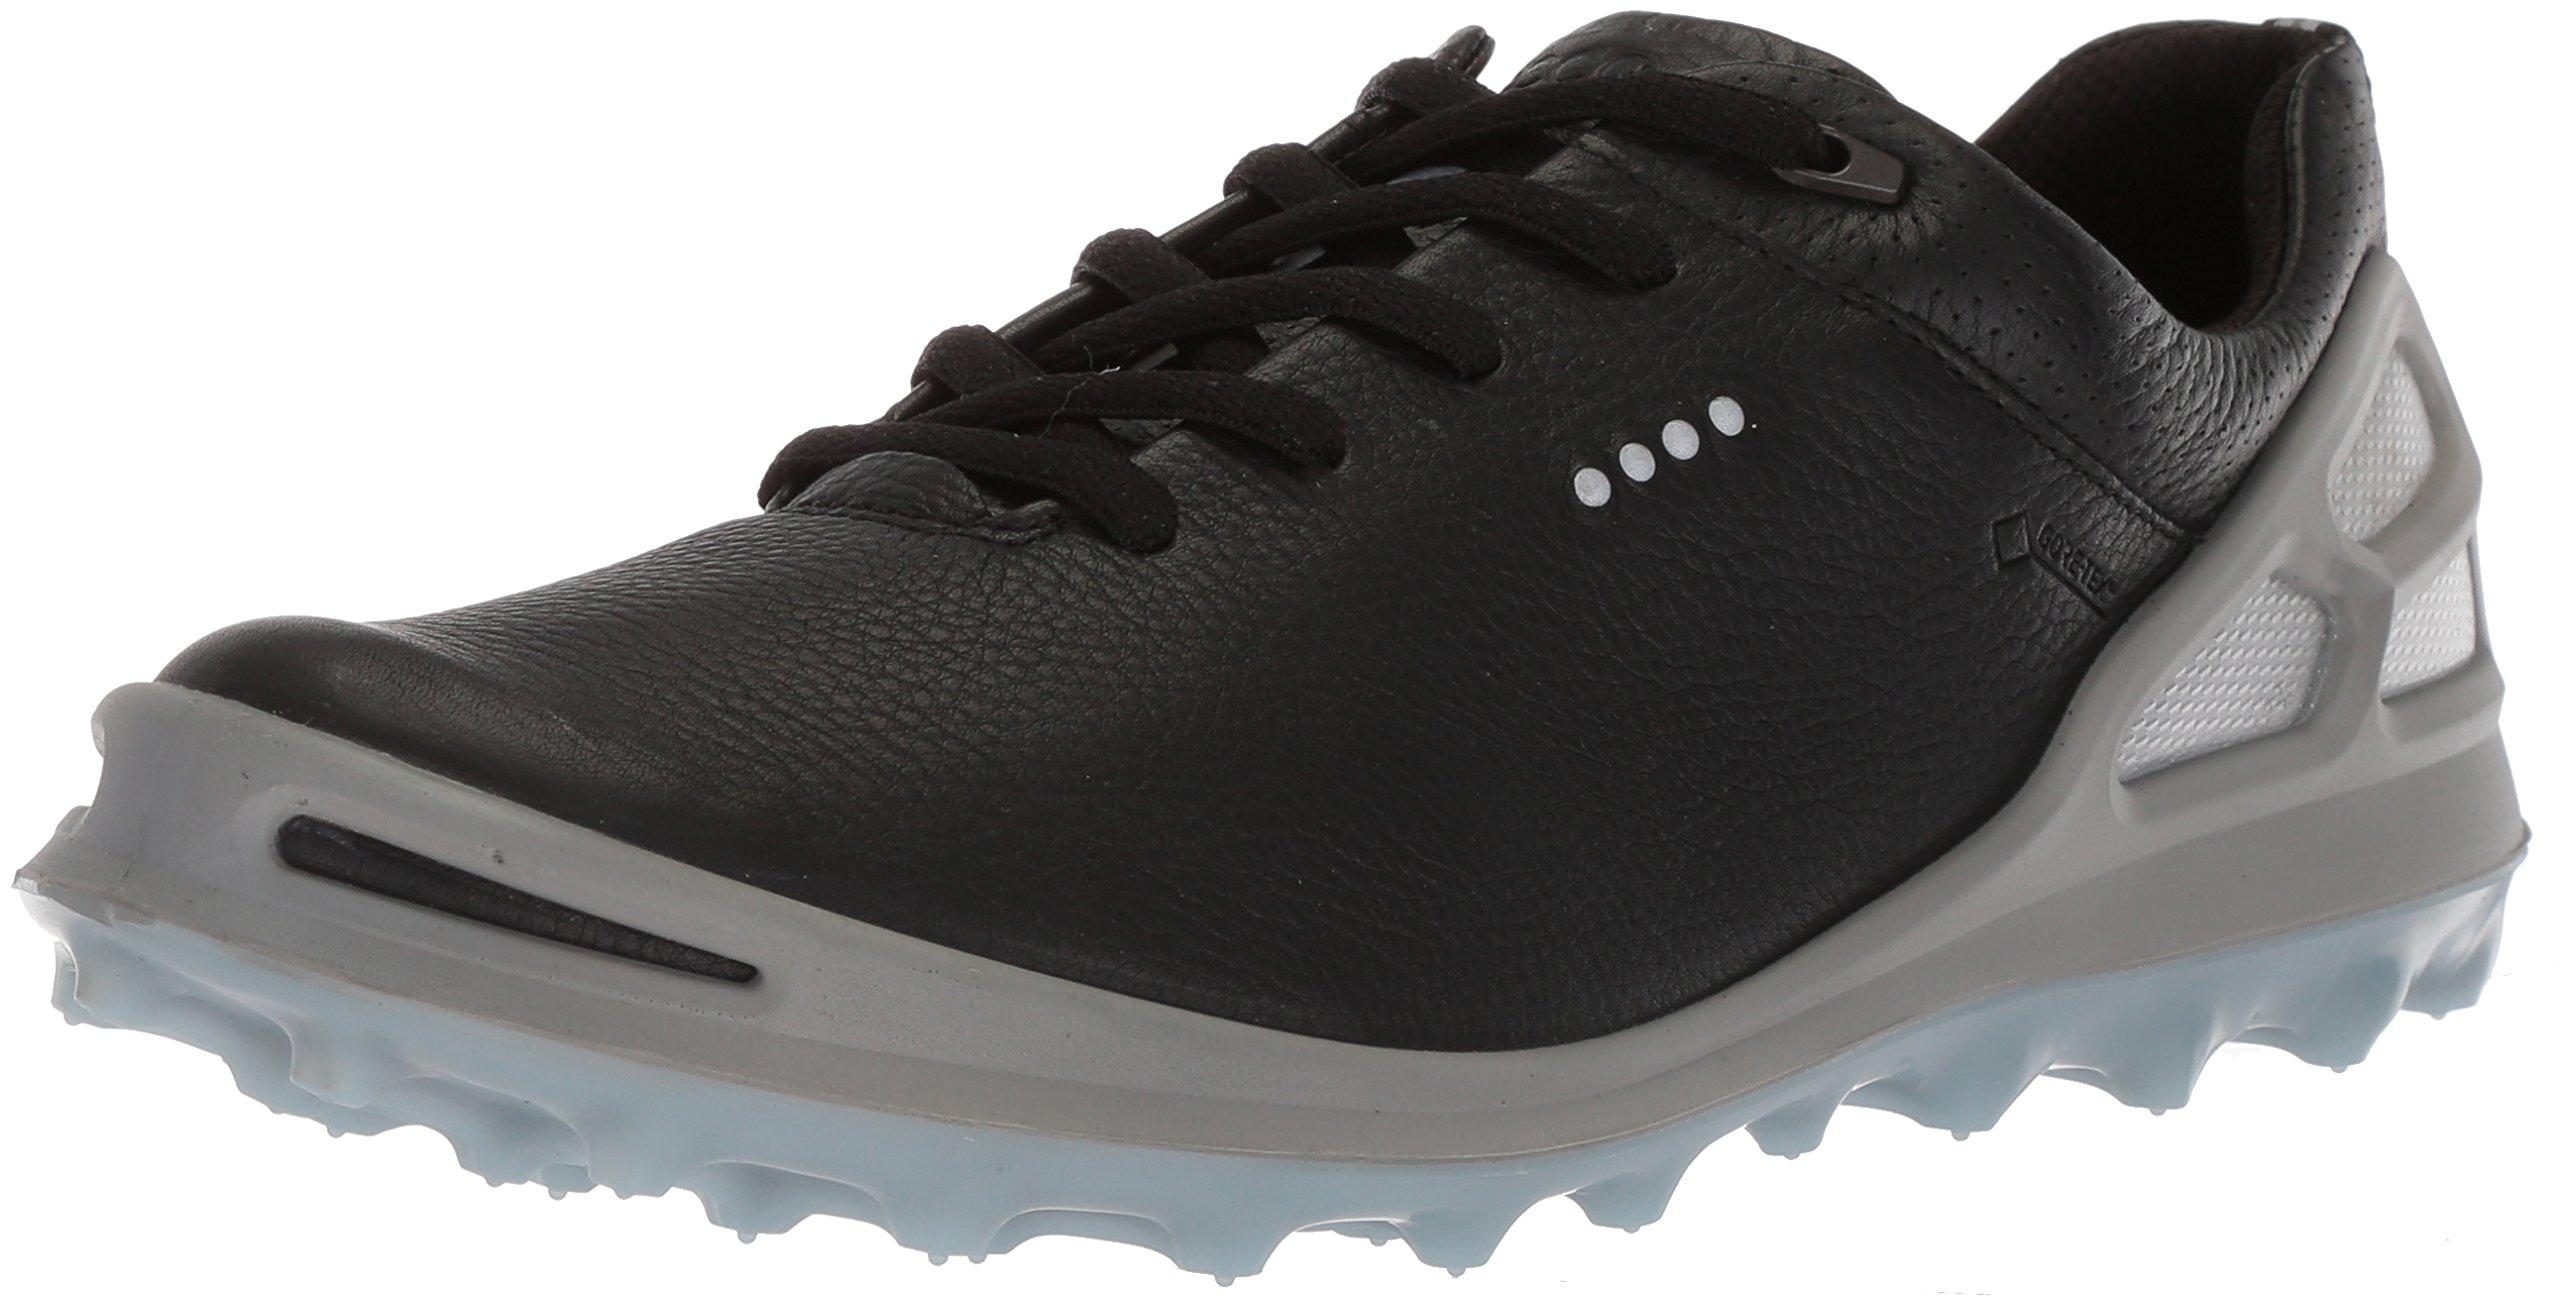 ECCO Women's Cage Pro Gore-Tex Golf Shoe, Black/Arona, 8 M US by ECCO